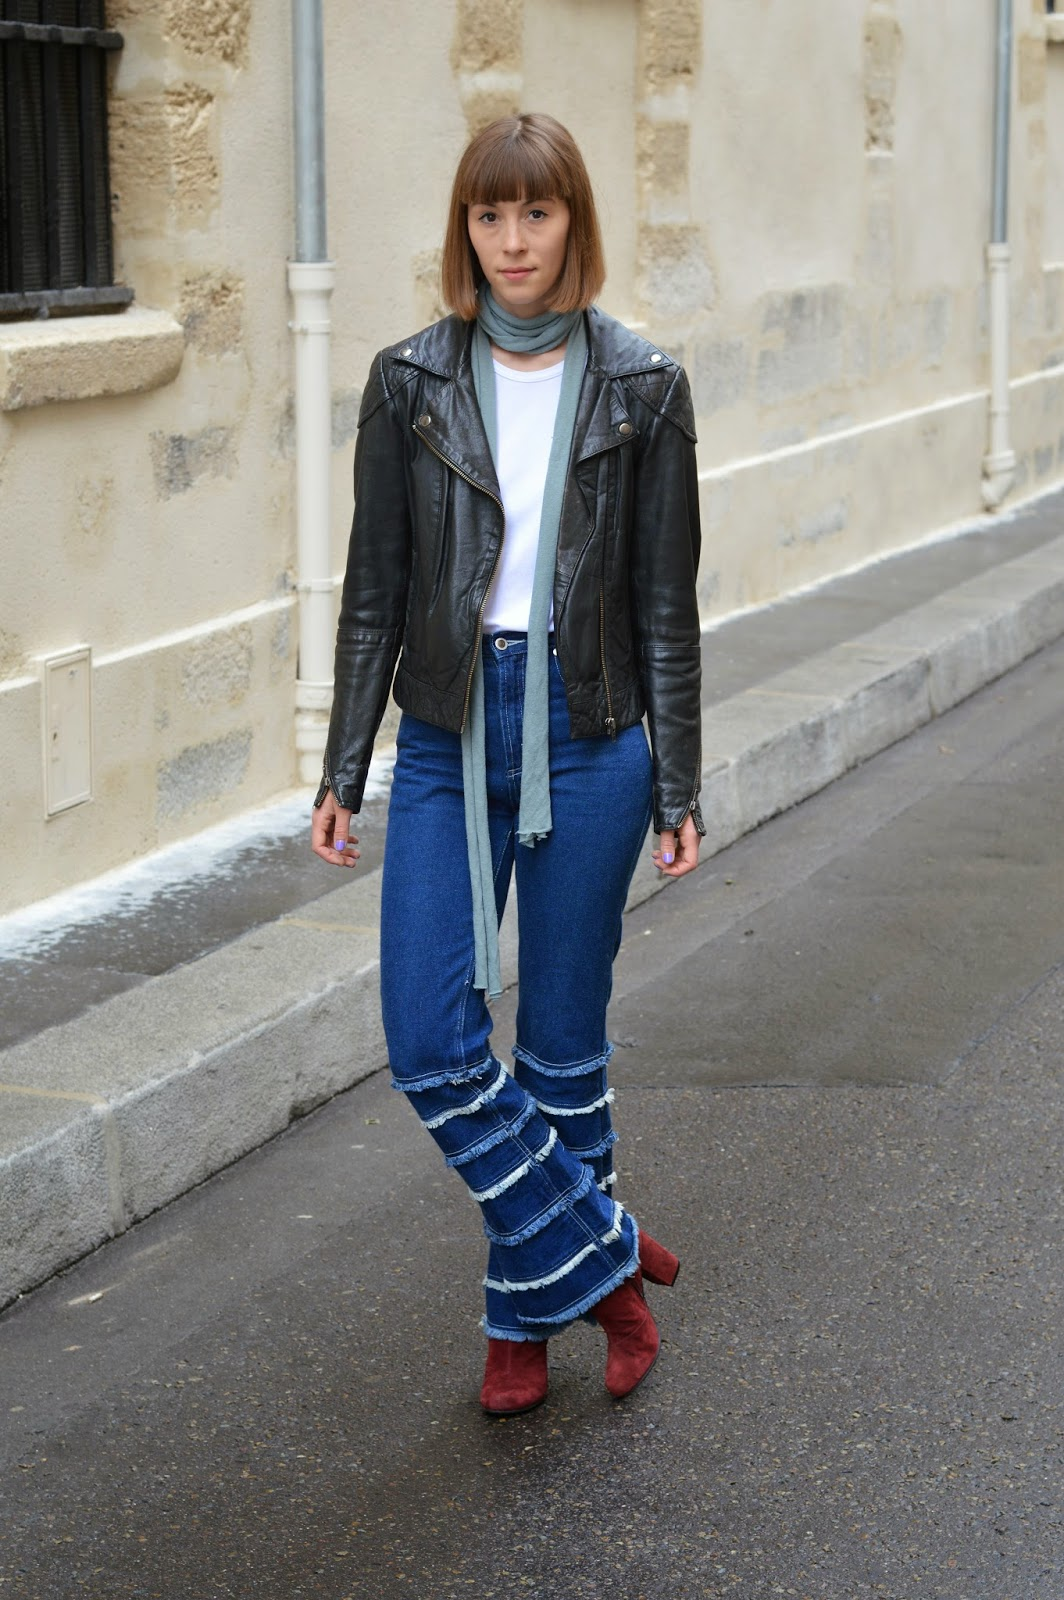 Fringed denim flares, 70s trend, skinny scarf